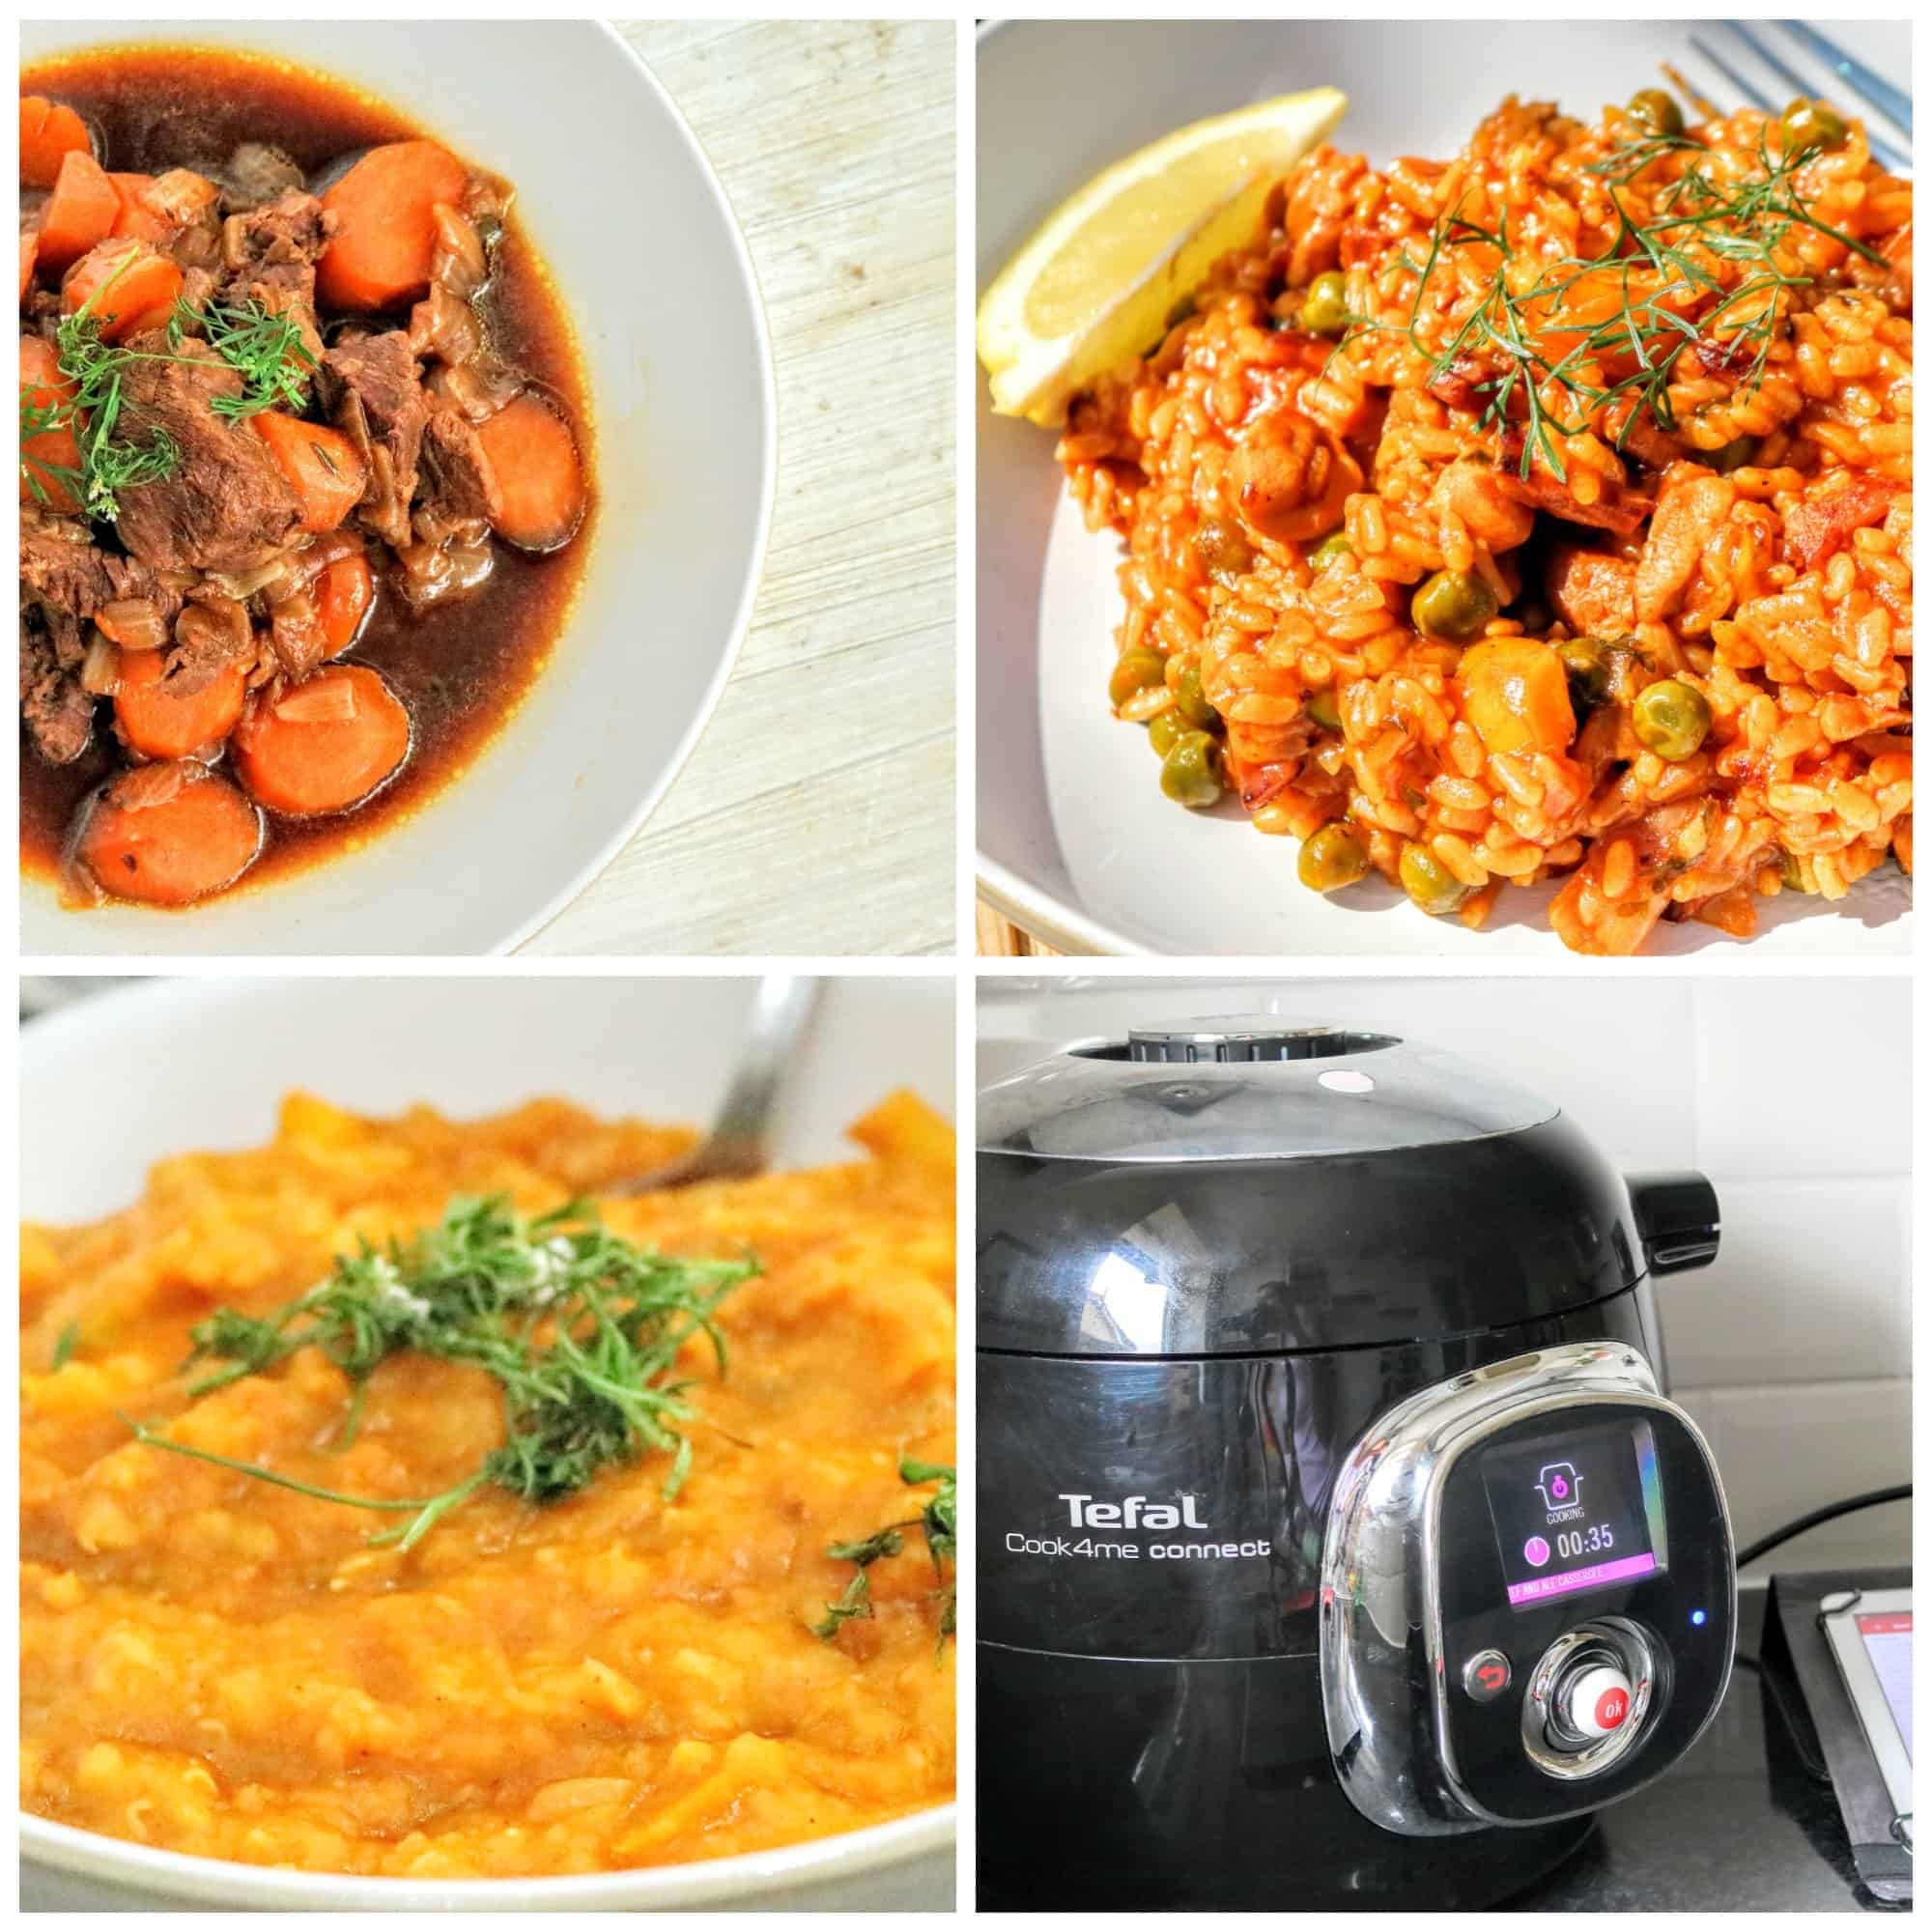 tefal cook4me connect meals